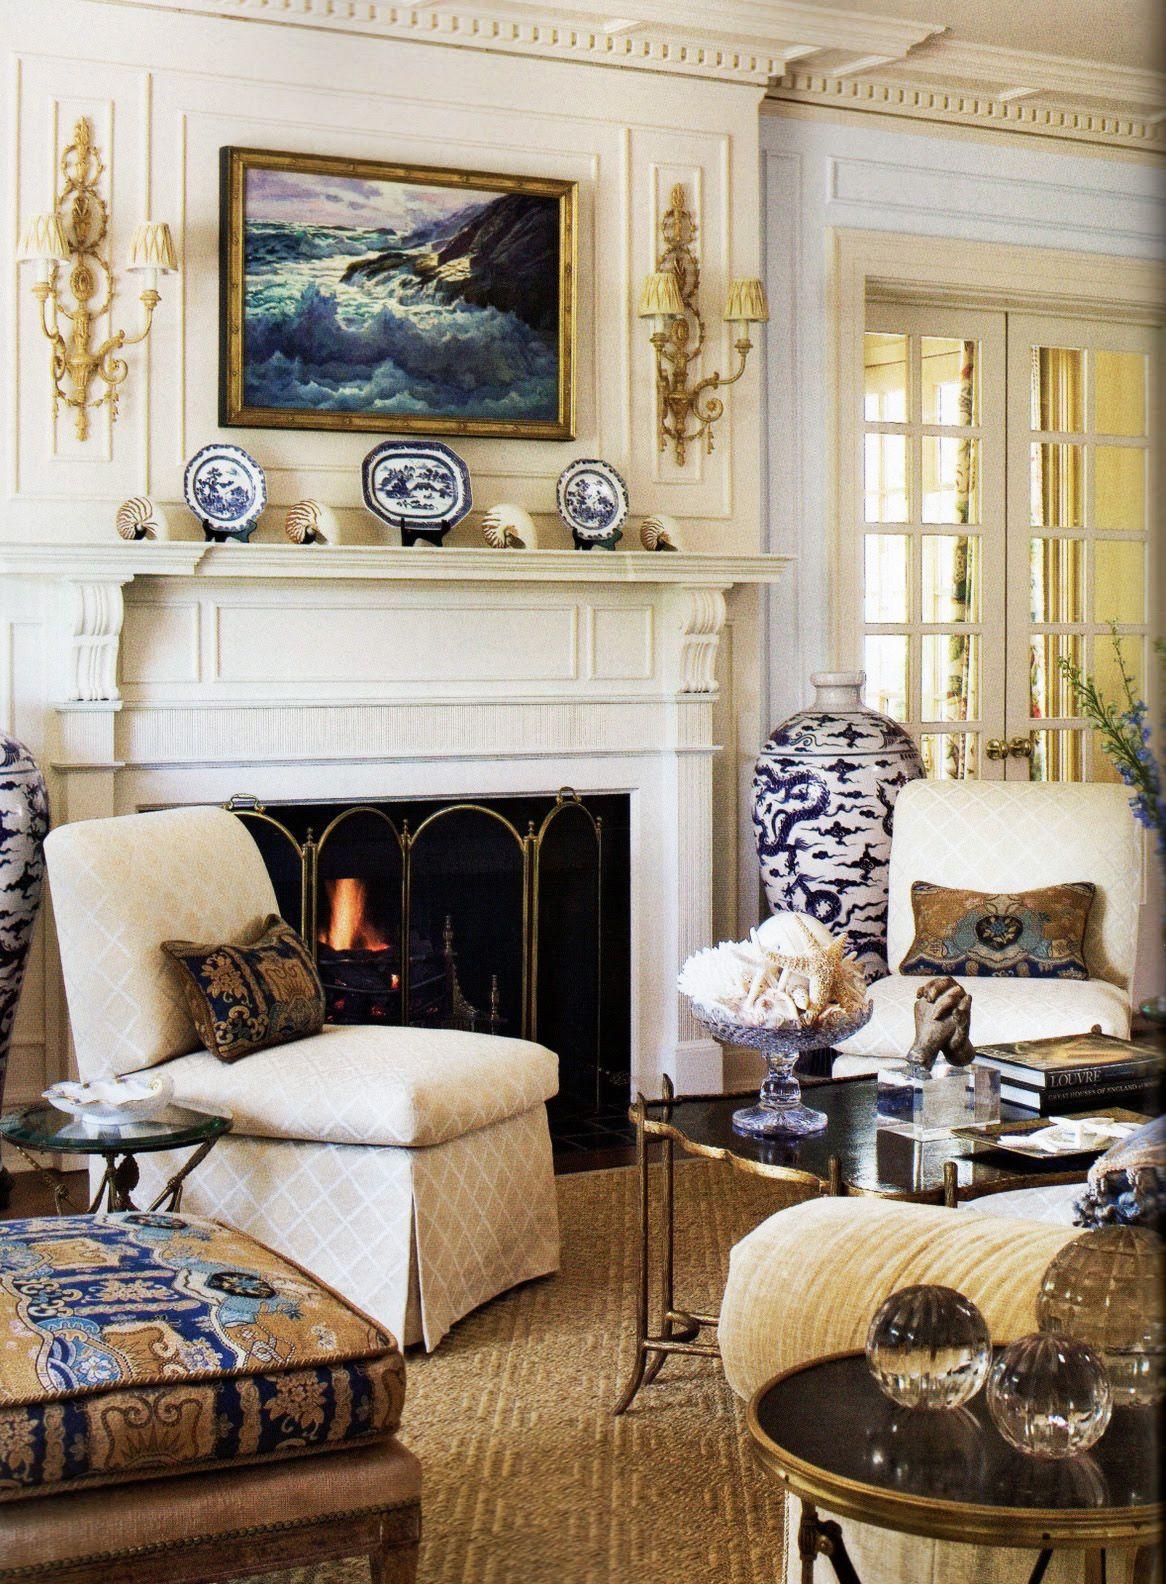 Traditional Italian Living Room Sets: Beautiful Living Room Decor With Carved Wood Italian Adam